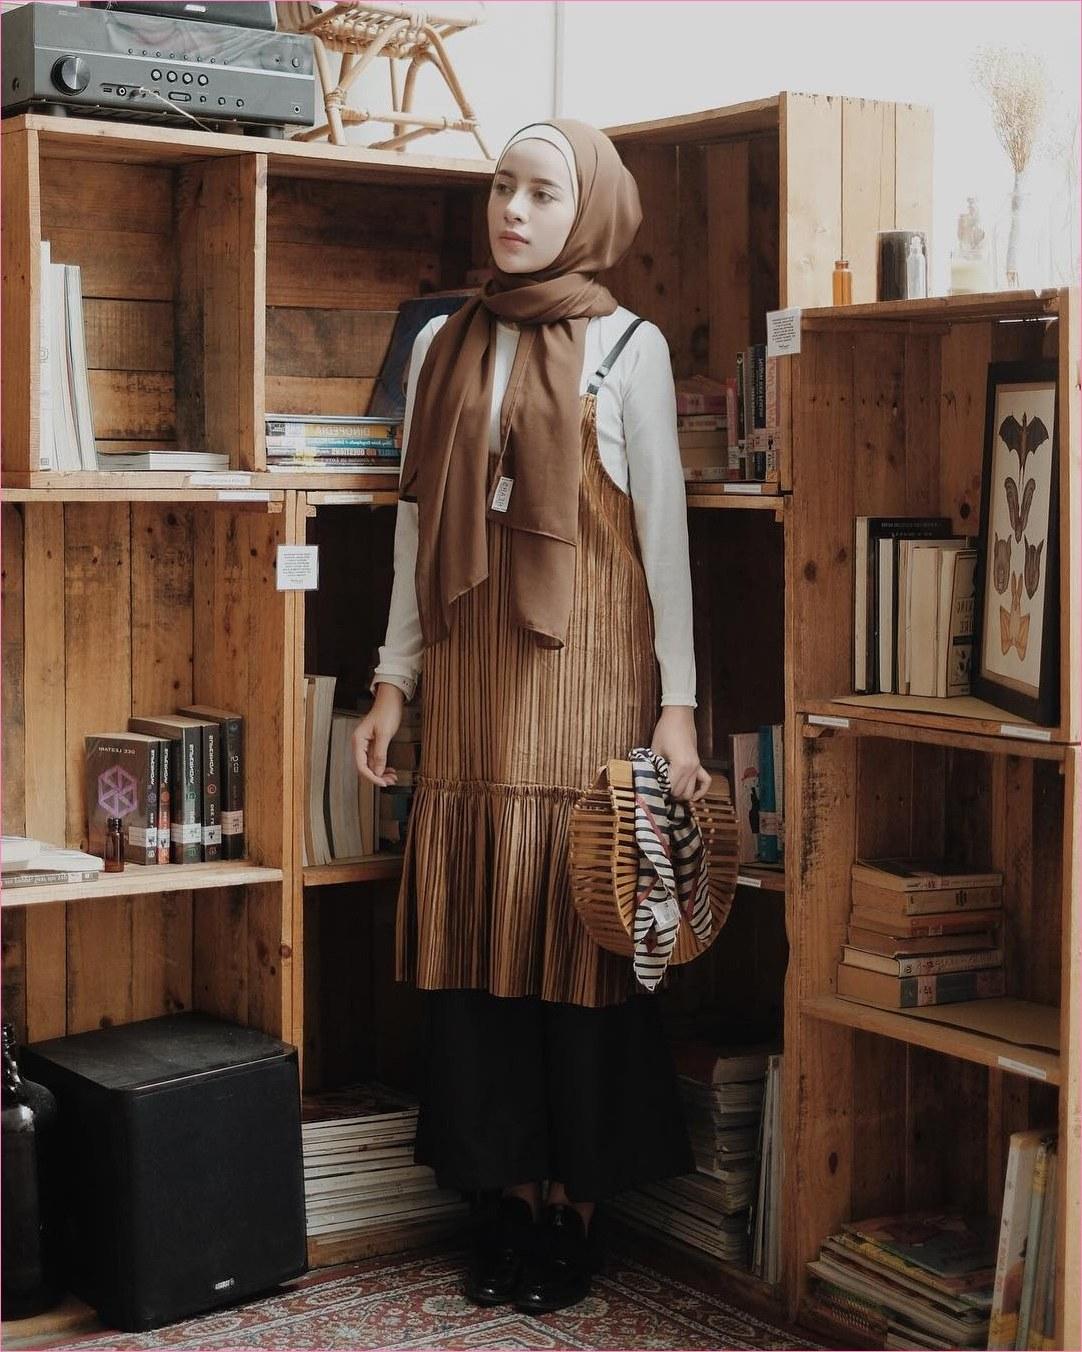 Inspirasi Baju Lebaran Thn 2019 Fmdf 80 Model Baju Lebaran Terbaru 2019 Muslimah Trendy Model